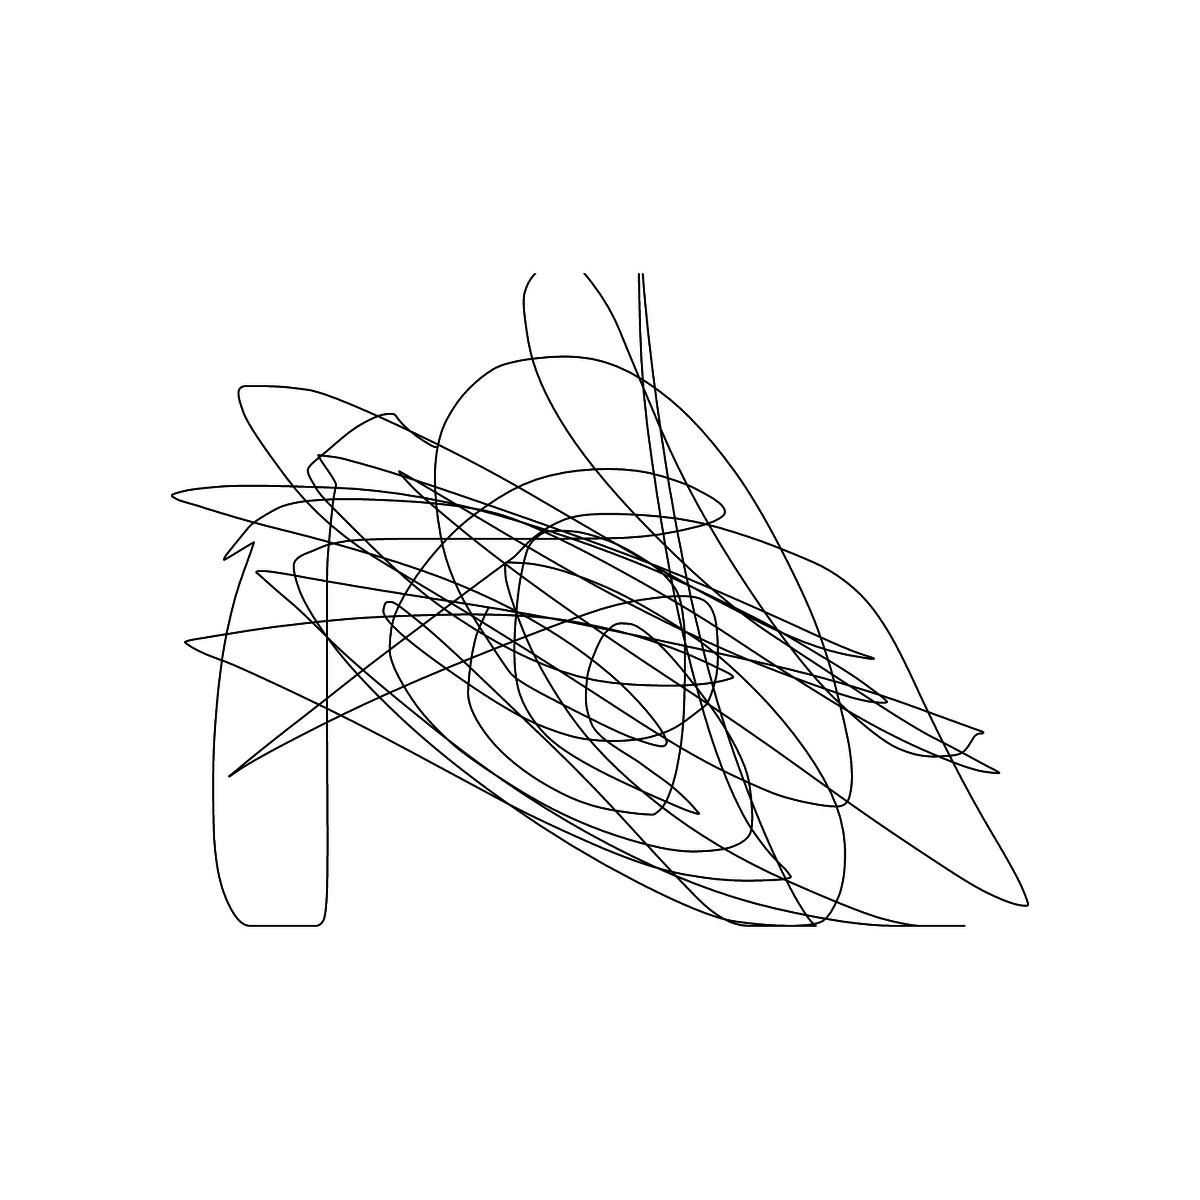 BAAAM drawing#7593 lat:-33.7883872985839840lng: 150.8205718994140600